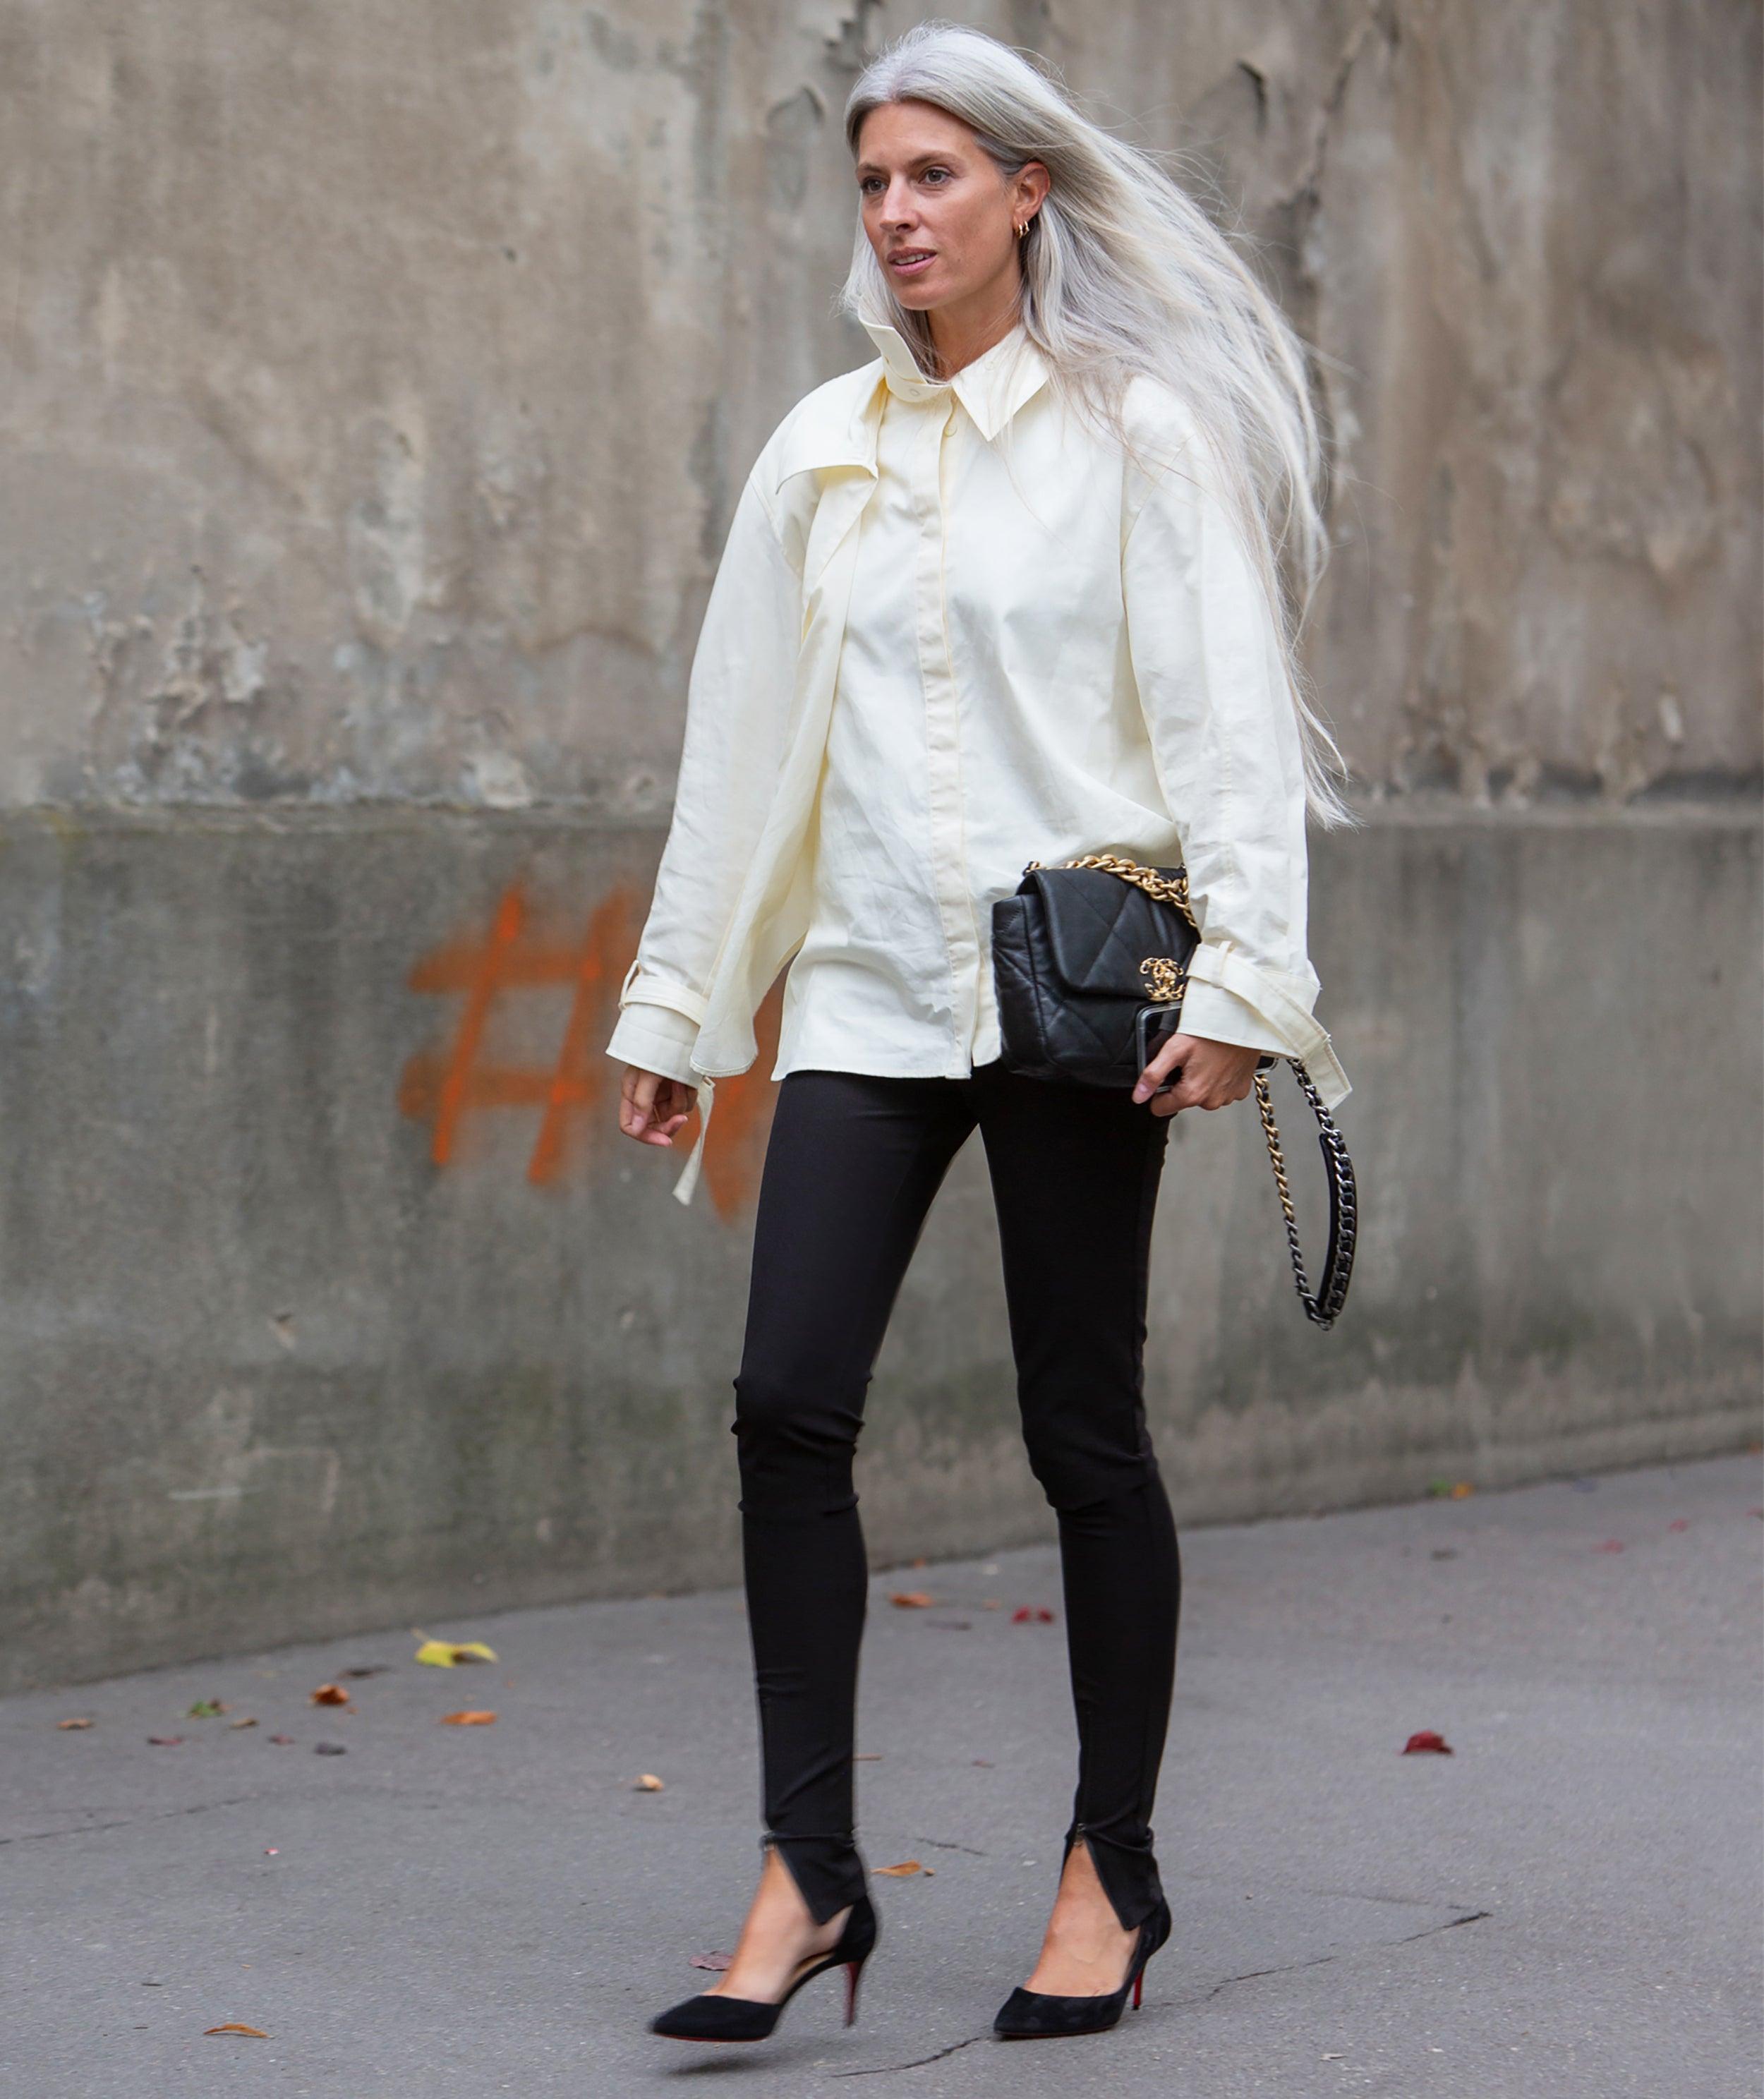 adidas leggings outfit ideas